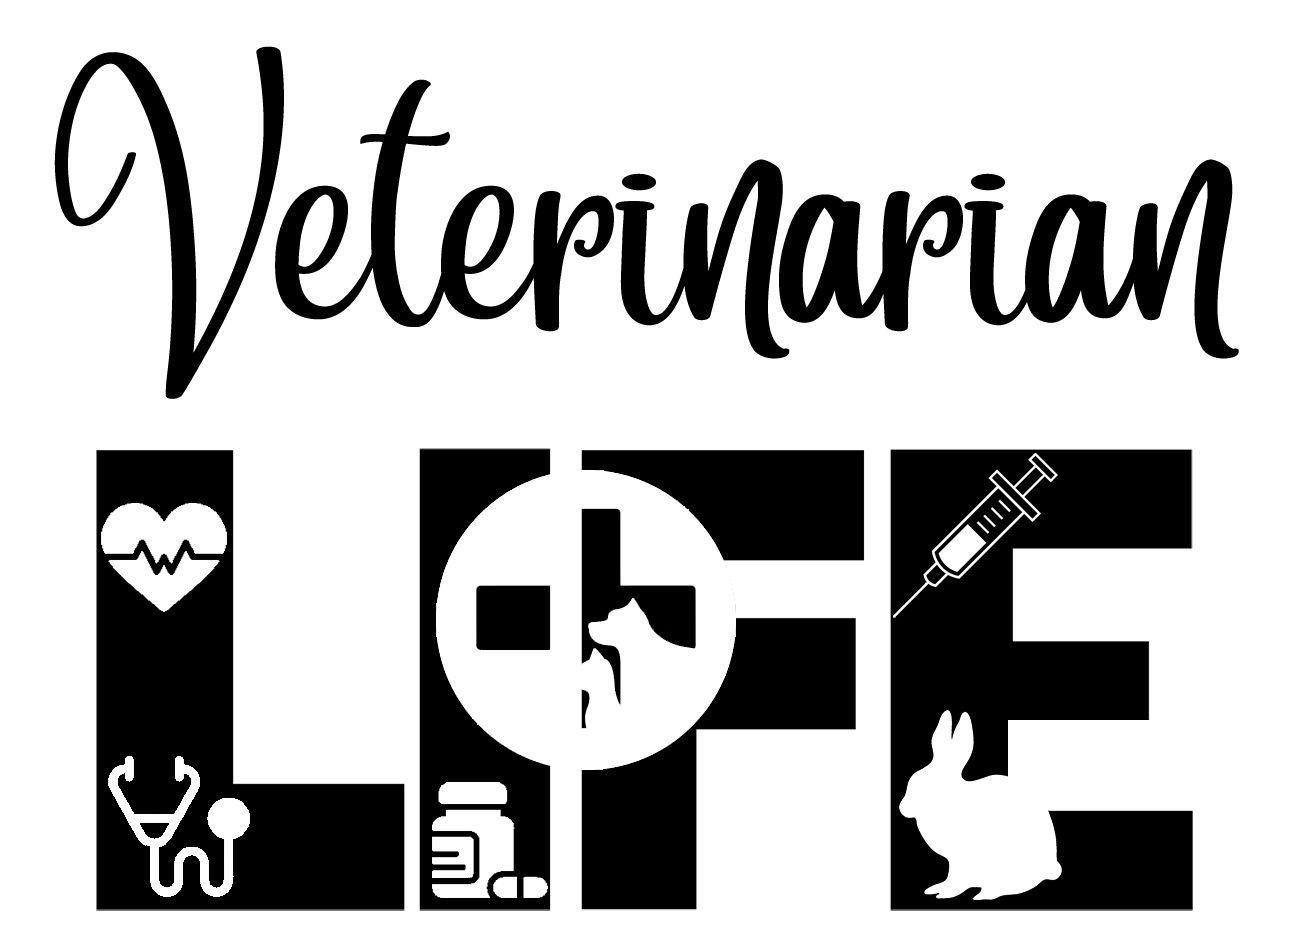 Free Veterinarian Life SVG File in 2020 Veterinarian